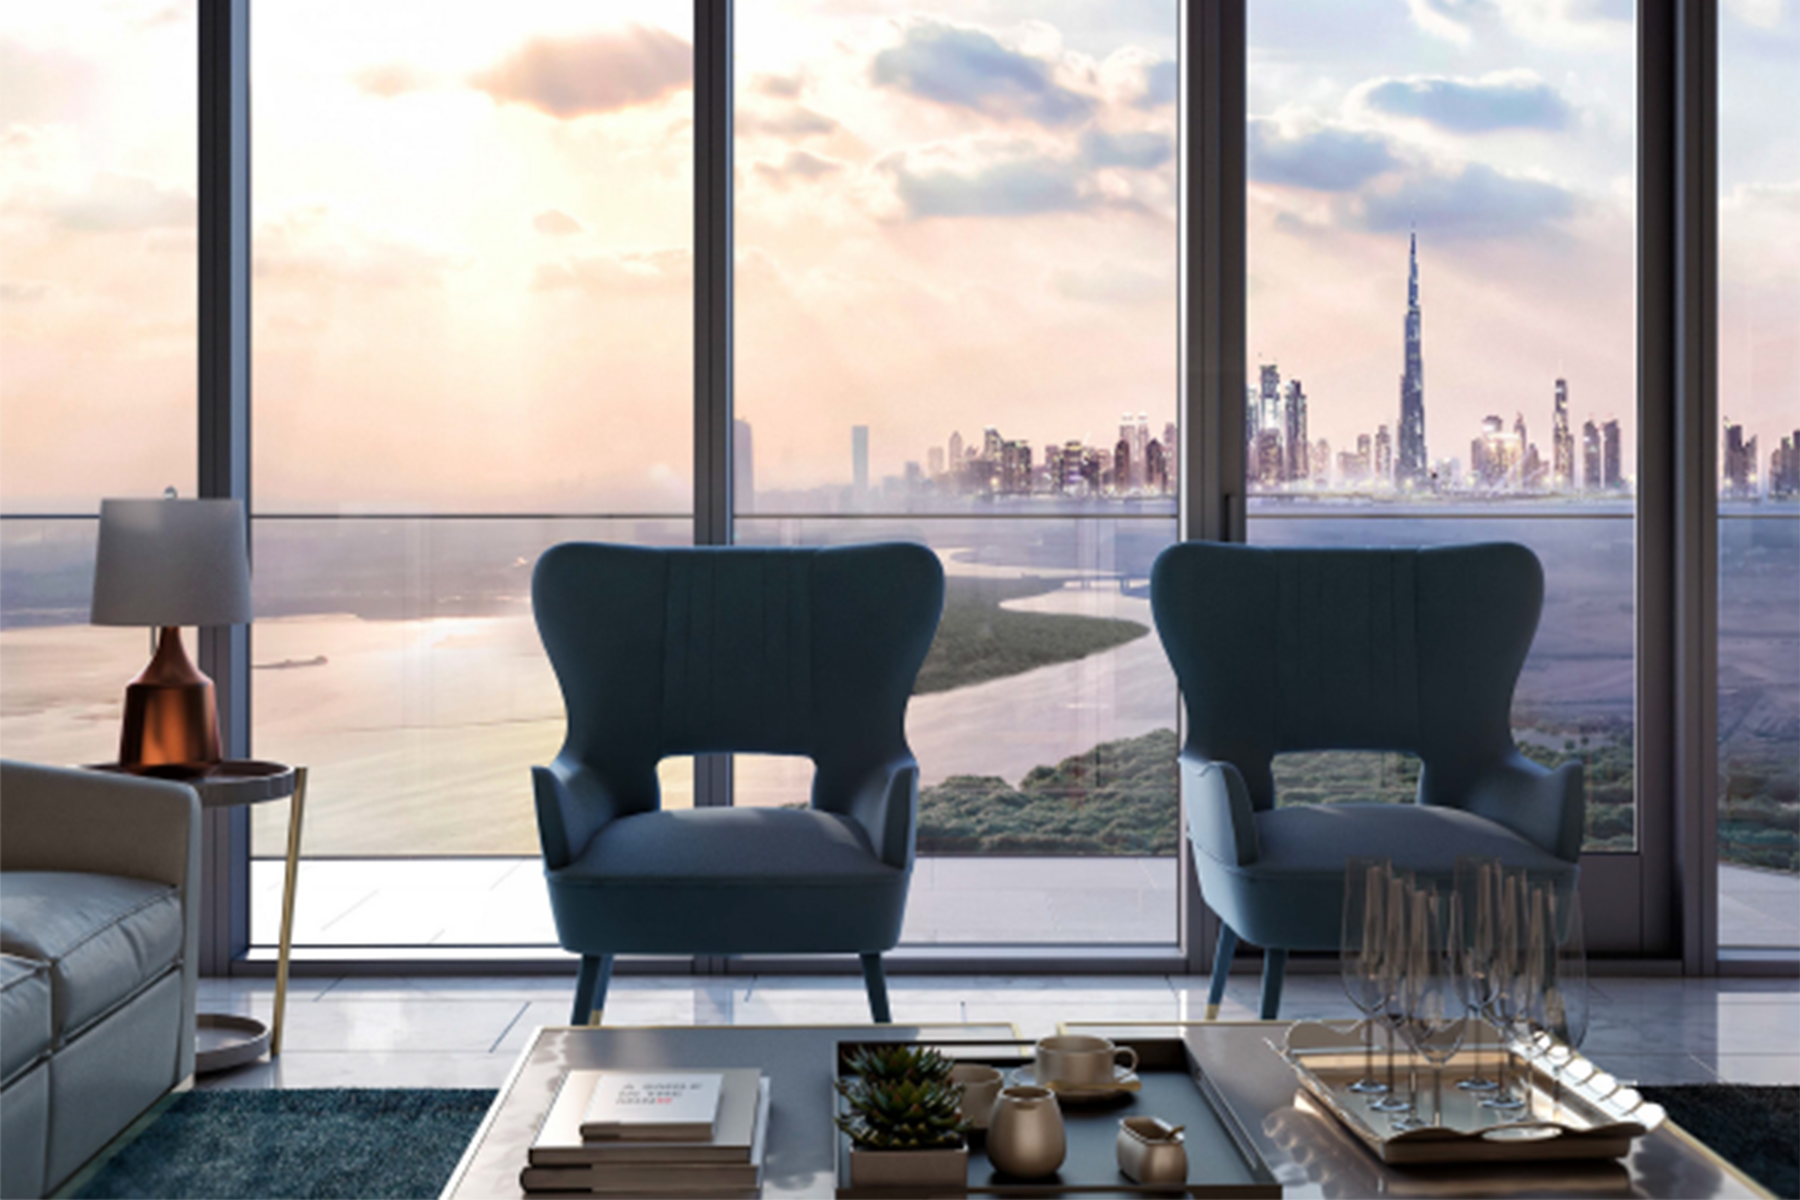 Apartments for Sale at 1BR New Tower View in Creek Harbour Dubai Creek Harbour Address Harbour Point Dubai, Dubai 00000 United Arab Emirates